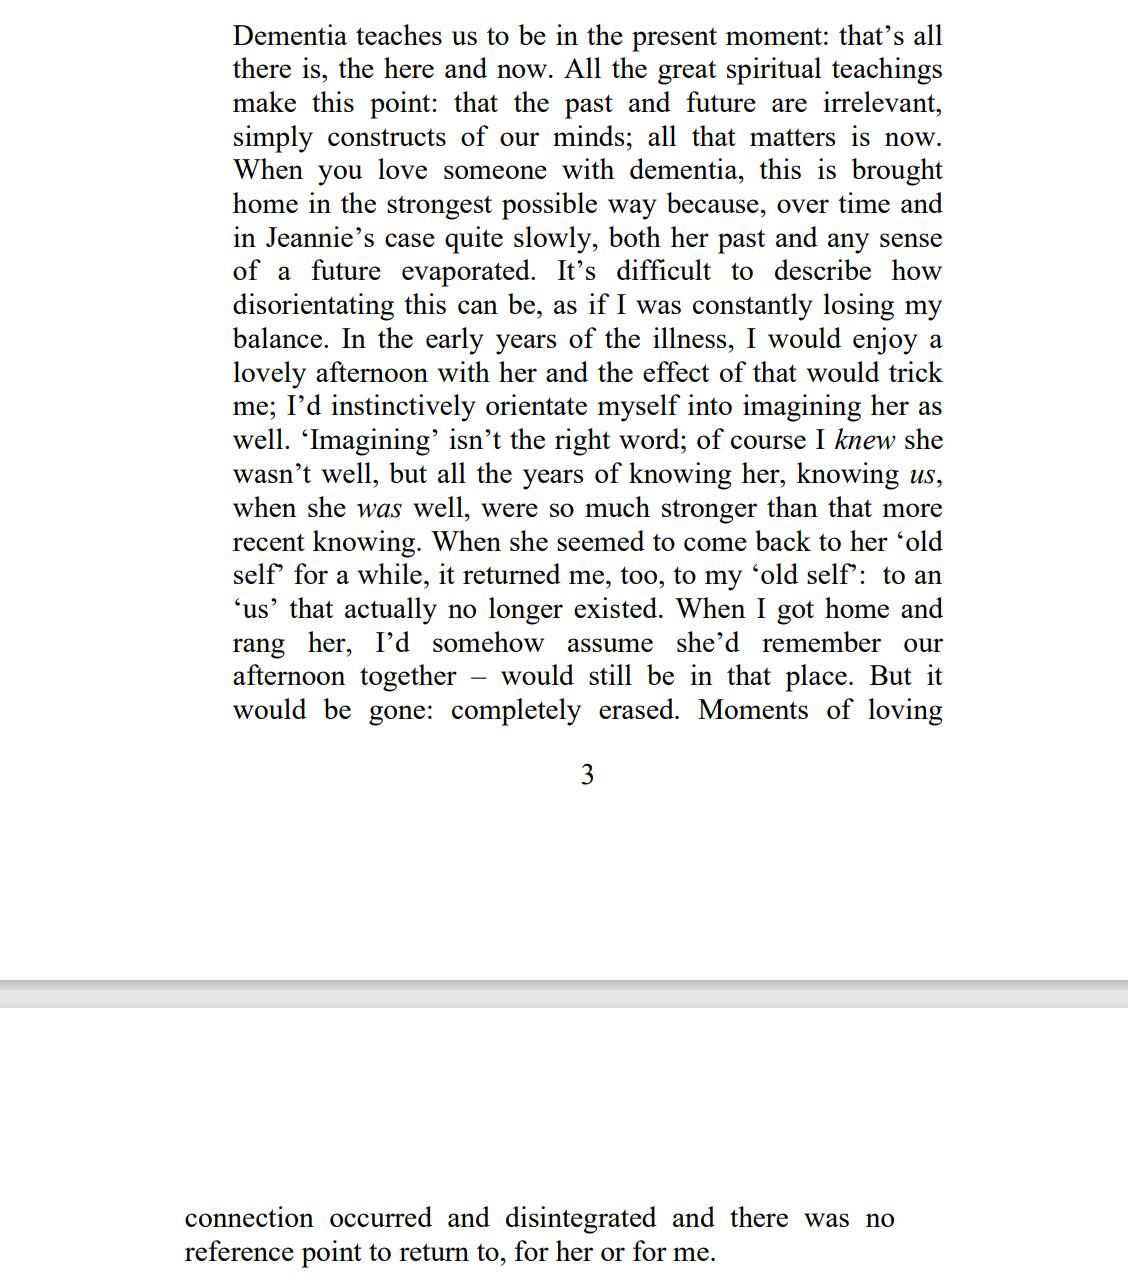 Dementia Teaches from preface of Lock Picker by Sue Proffitt